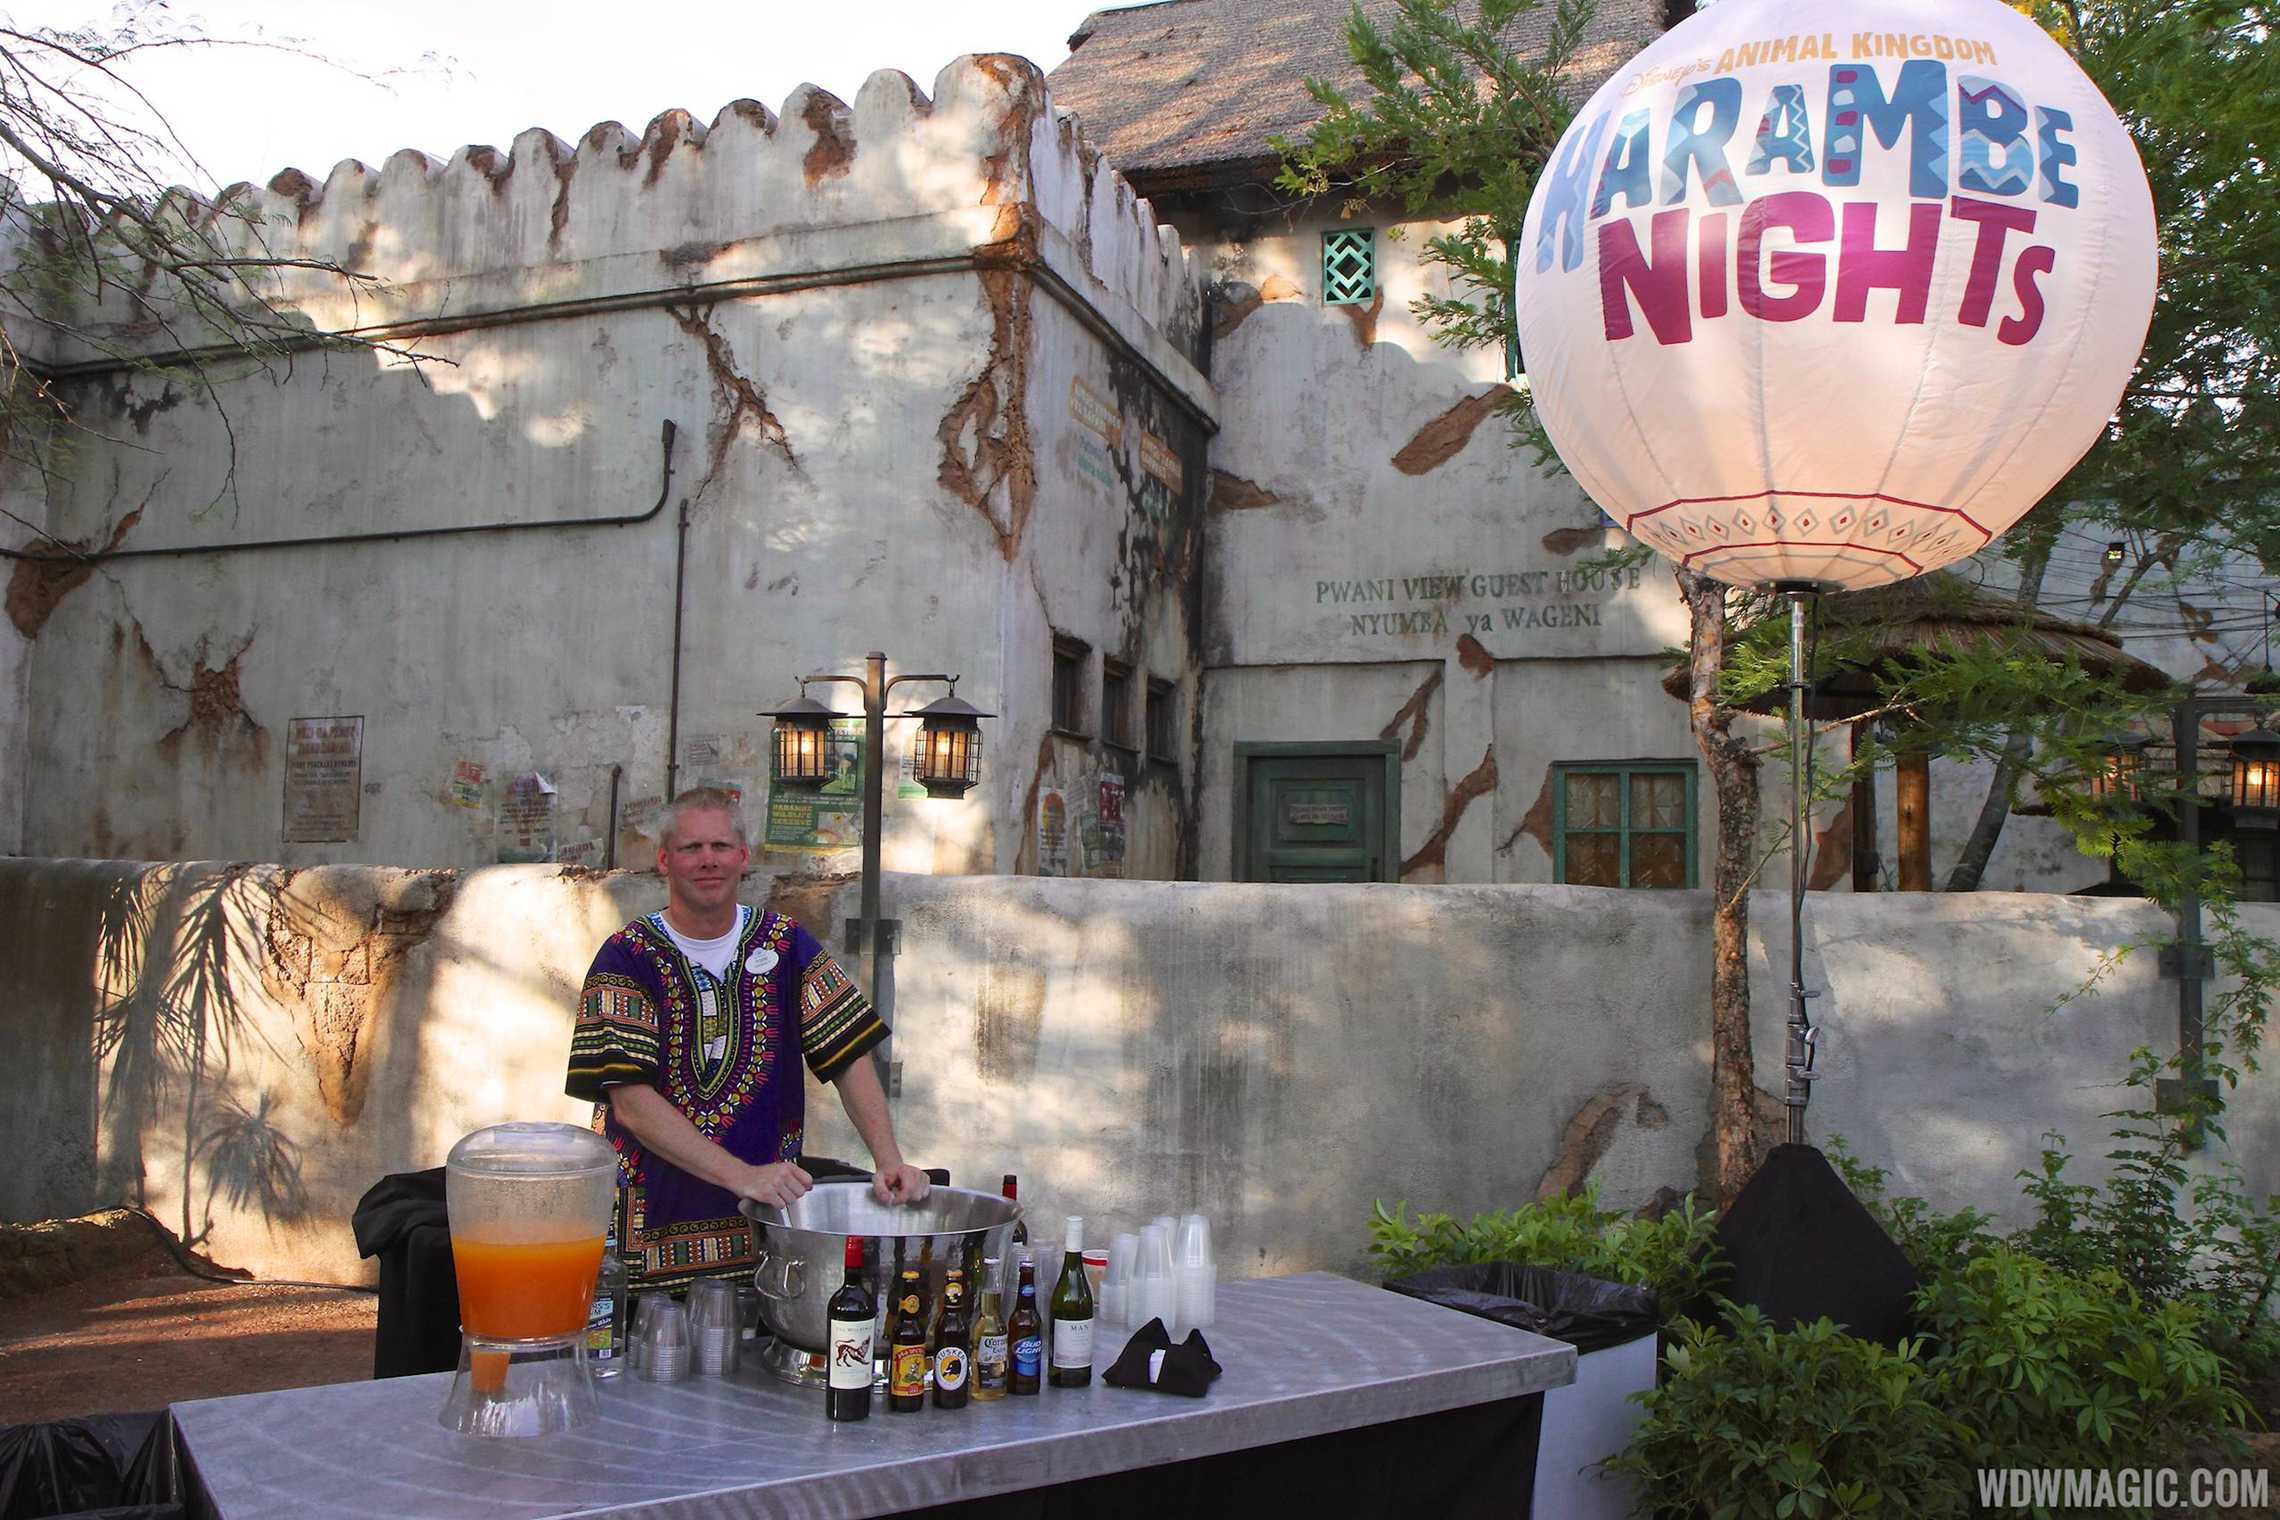 Harambe Nights - Pre-concert bar